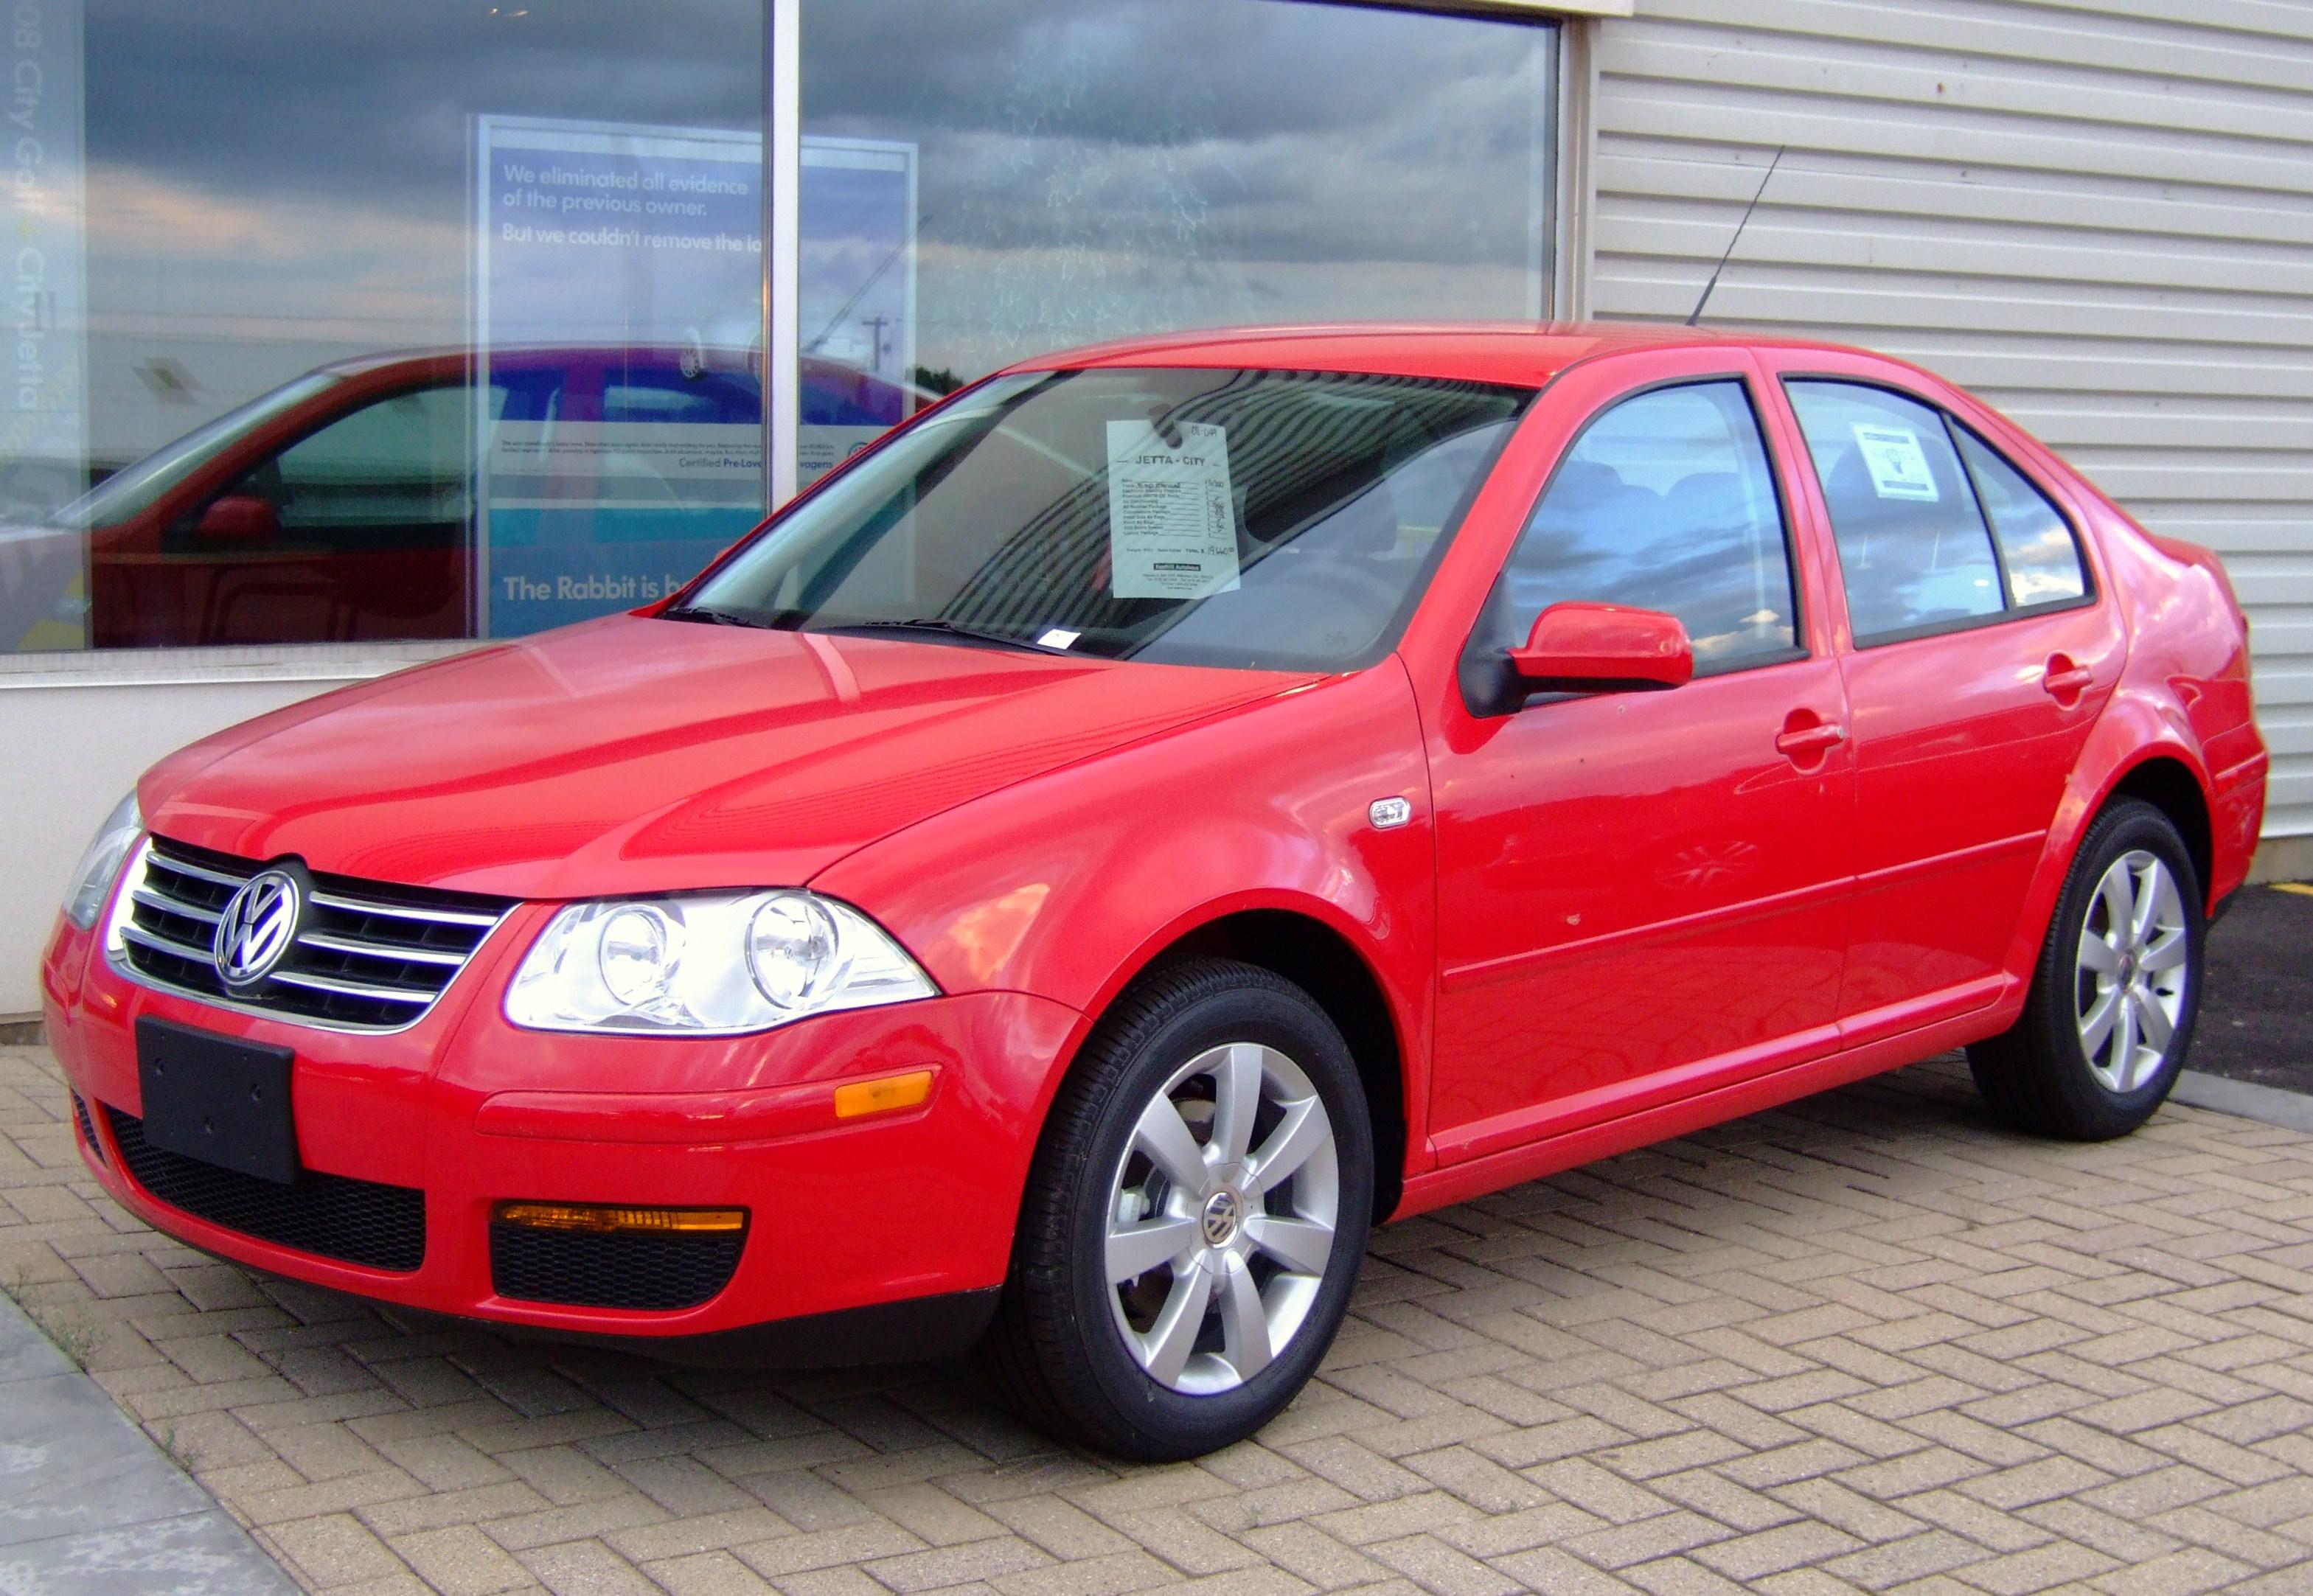 Volkswagen Bora Wikiwand